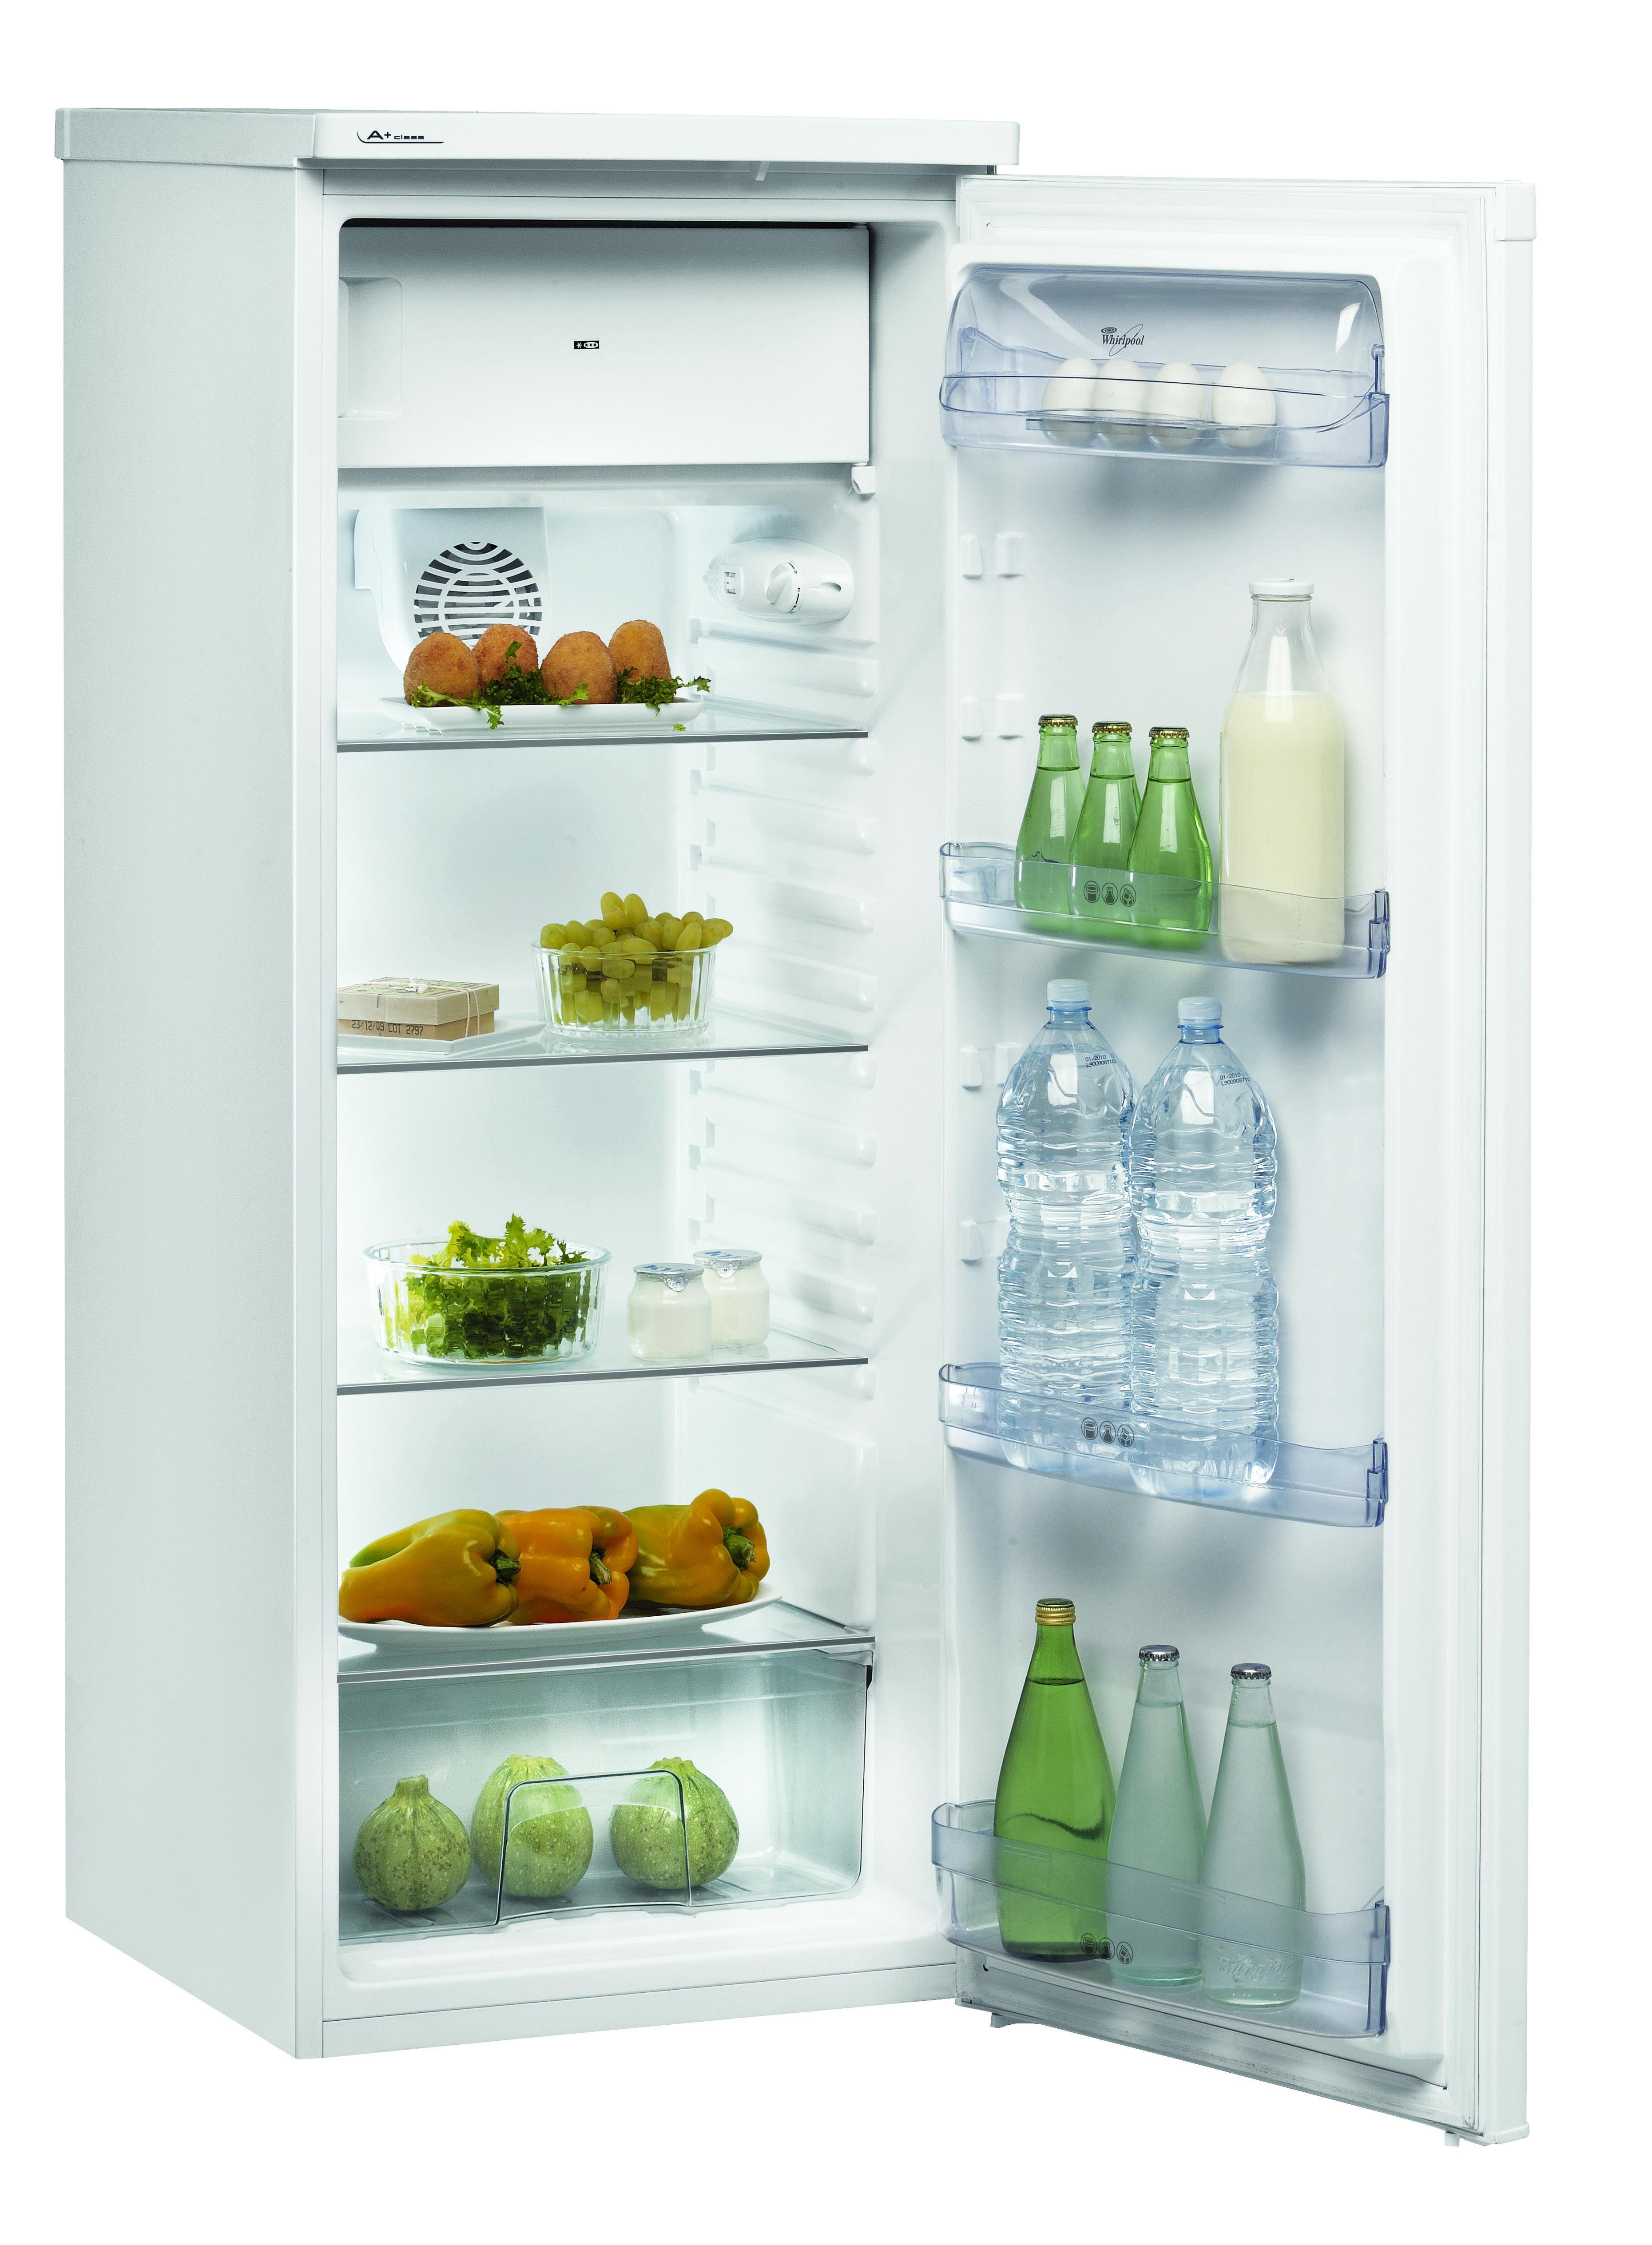 Réfrigérateur 1 porte - WM1552A+W